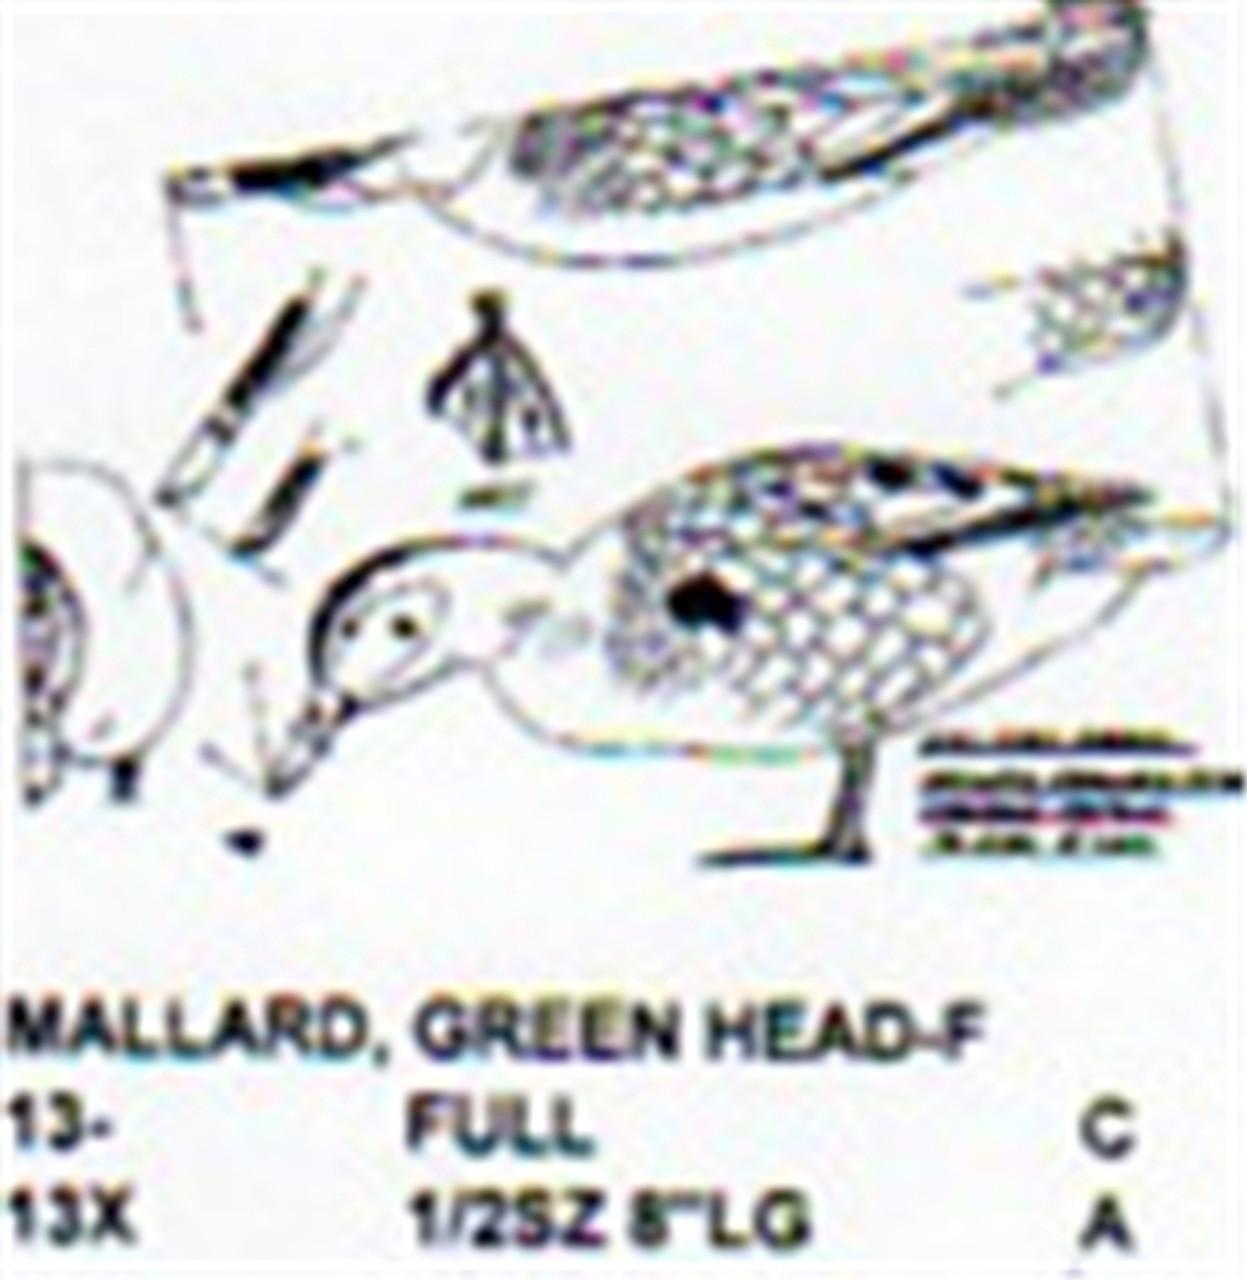 Green Head Mallard Female Standing/Feeding showing the Stiller pattern of a duck standing in the feeding position.